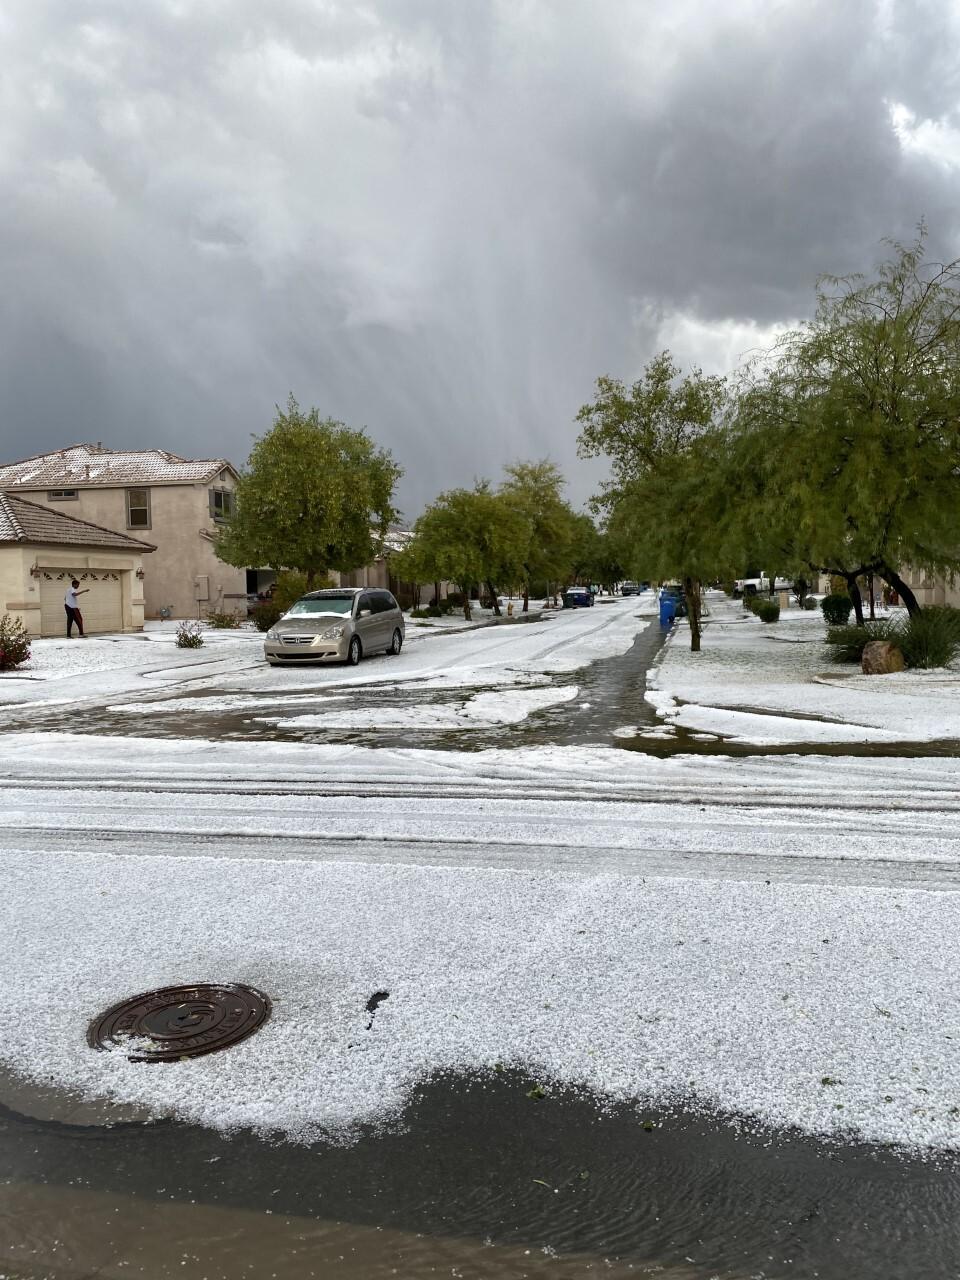 David_gonzalez_limas_laveen_hail2.jpg